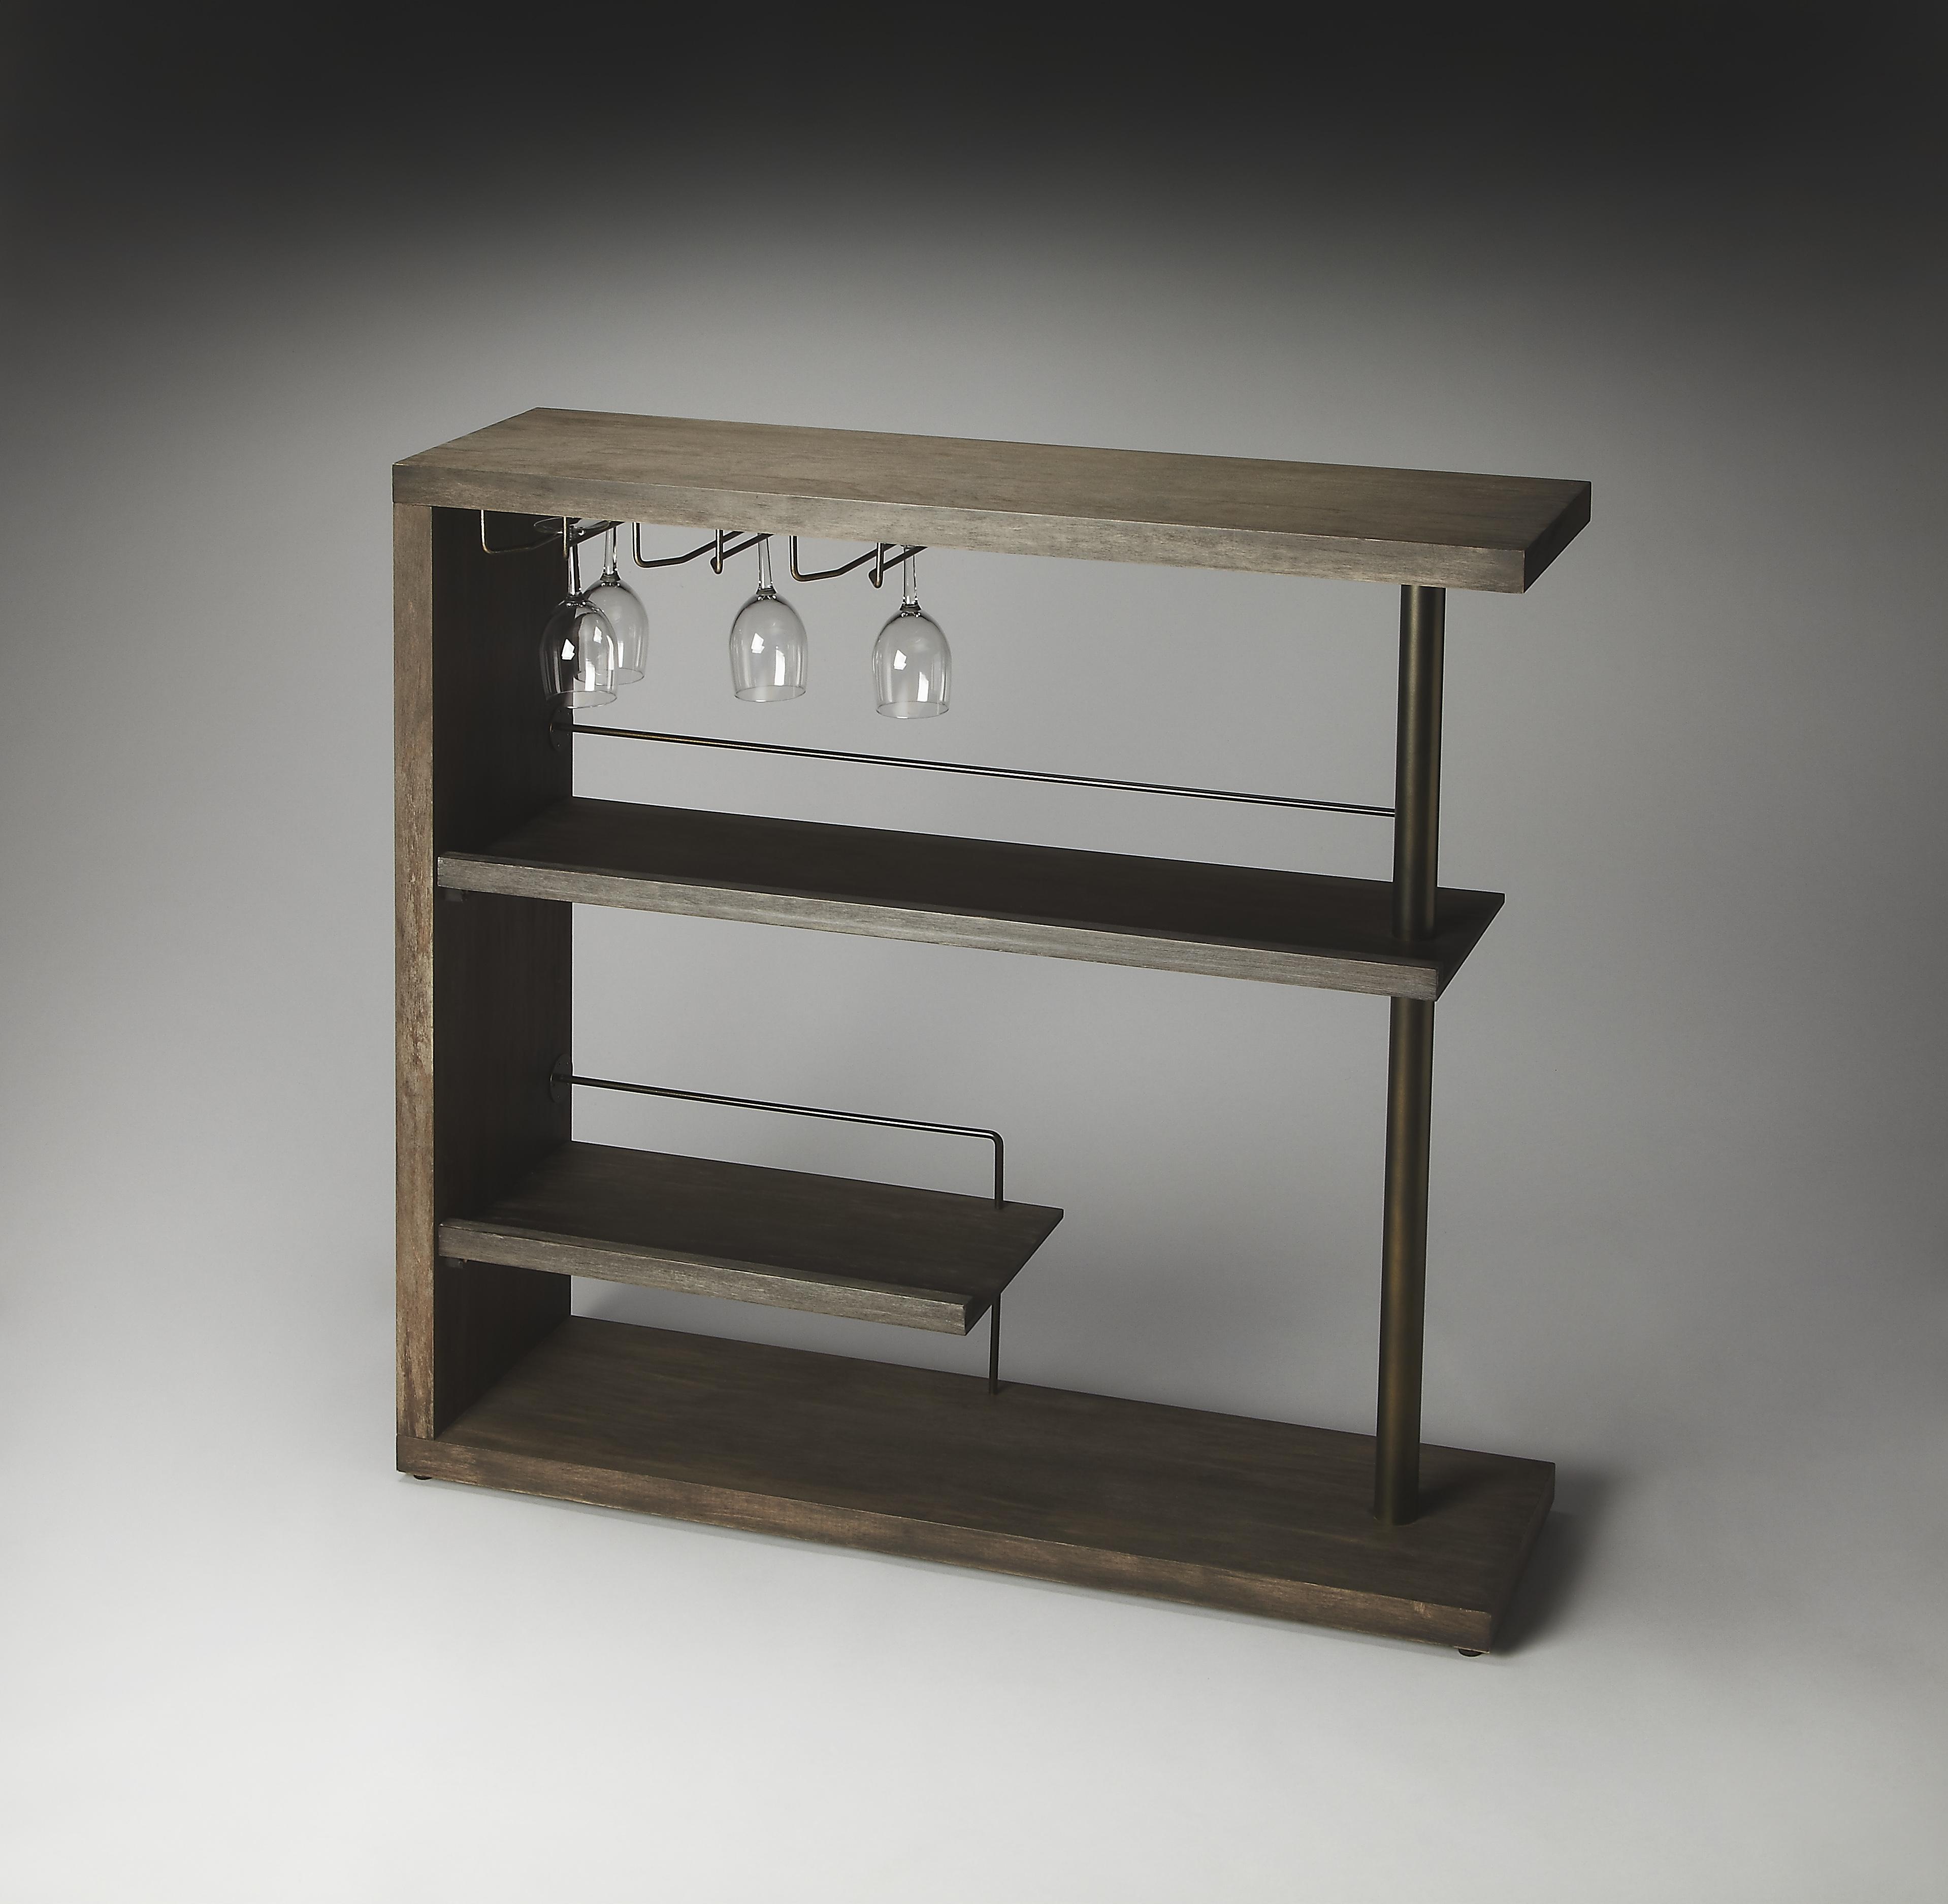 Butler Specialty Company Butler Loft Bar Cabinet - Item Number: 2664275